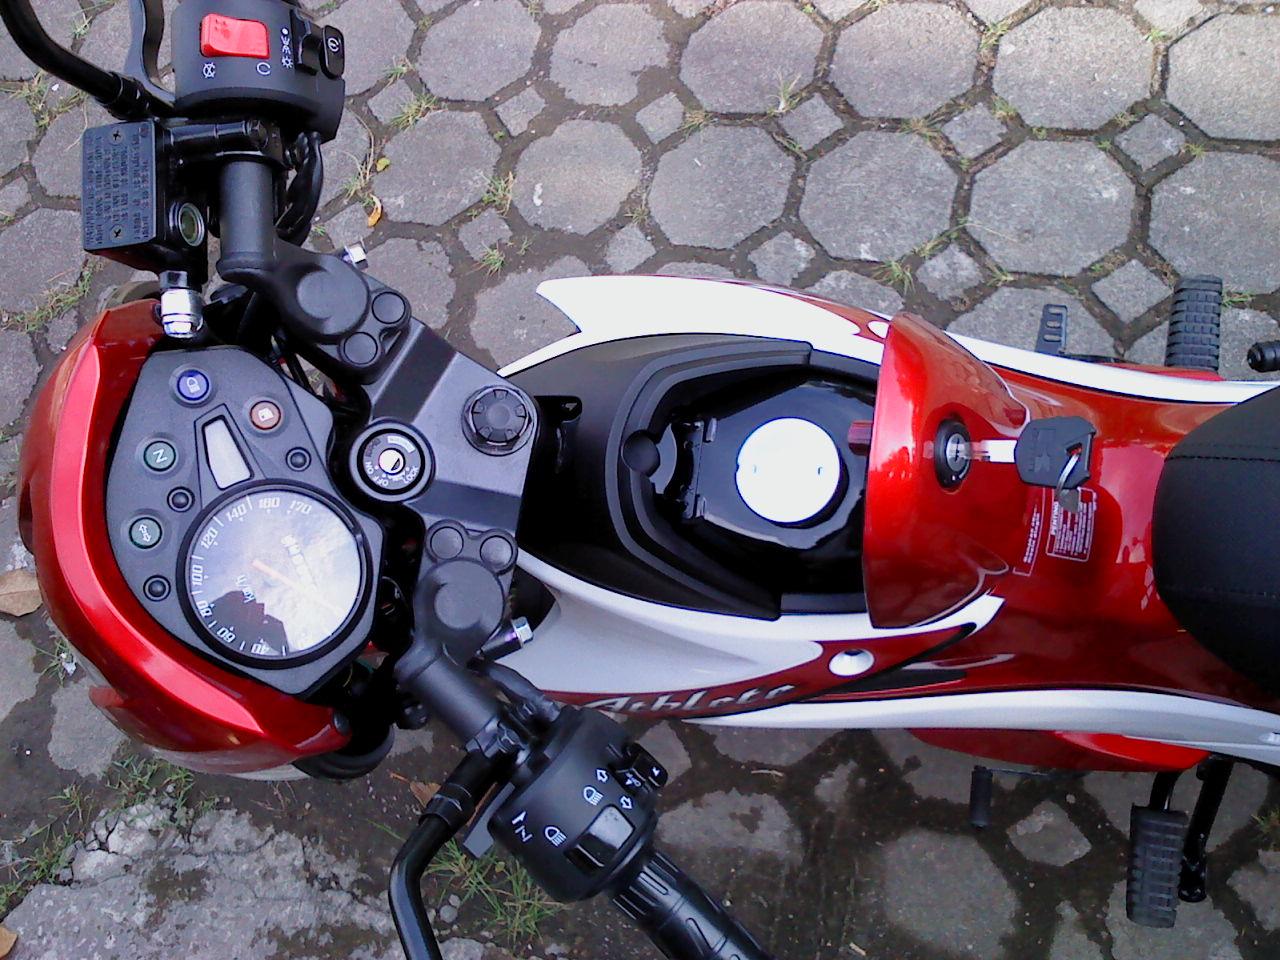 Kawasaki Athlete Merah